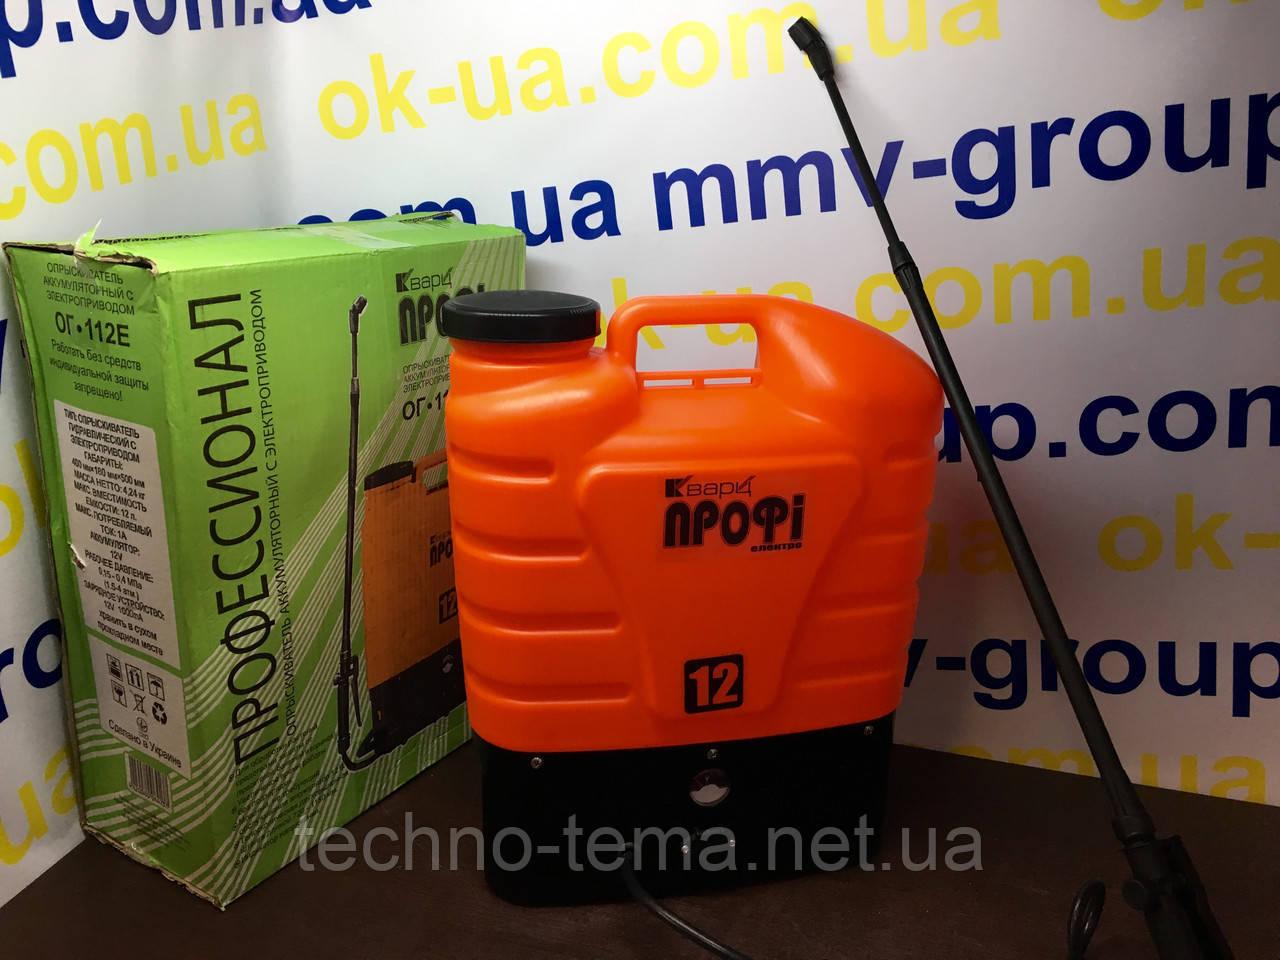 Опрыскиватель электрический Кварц Профи-электро ОГ-116Е